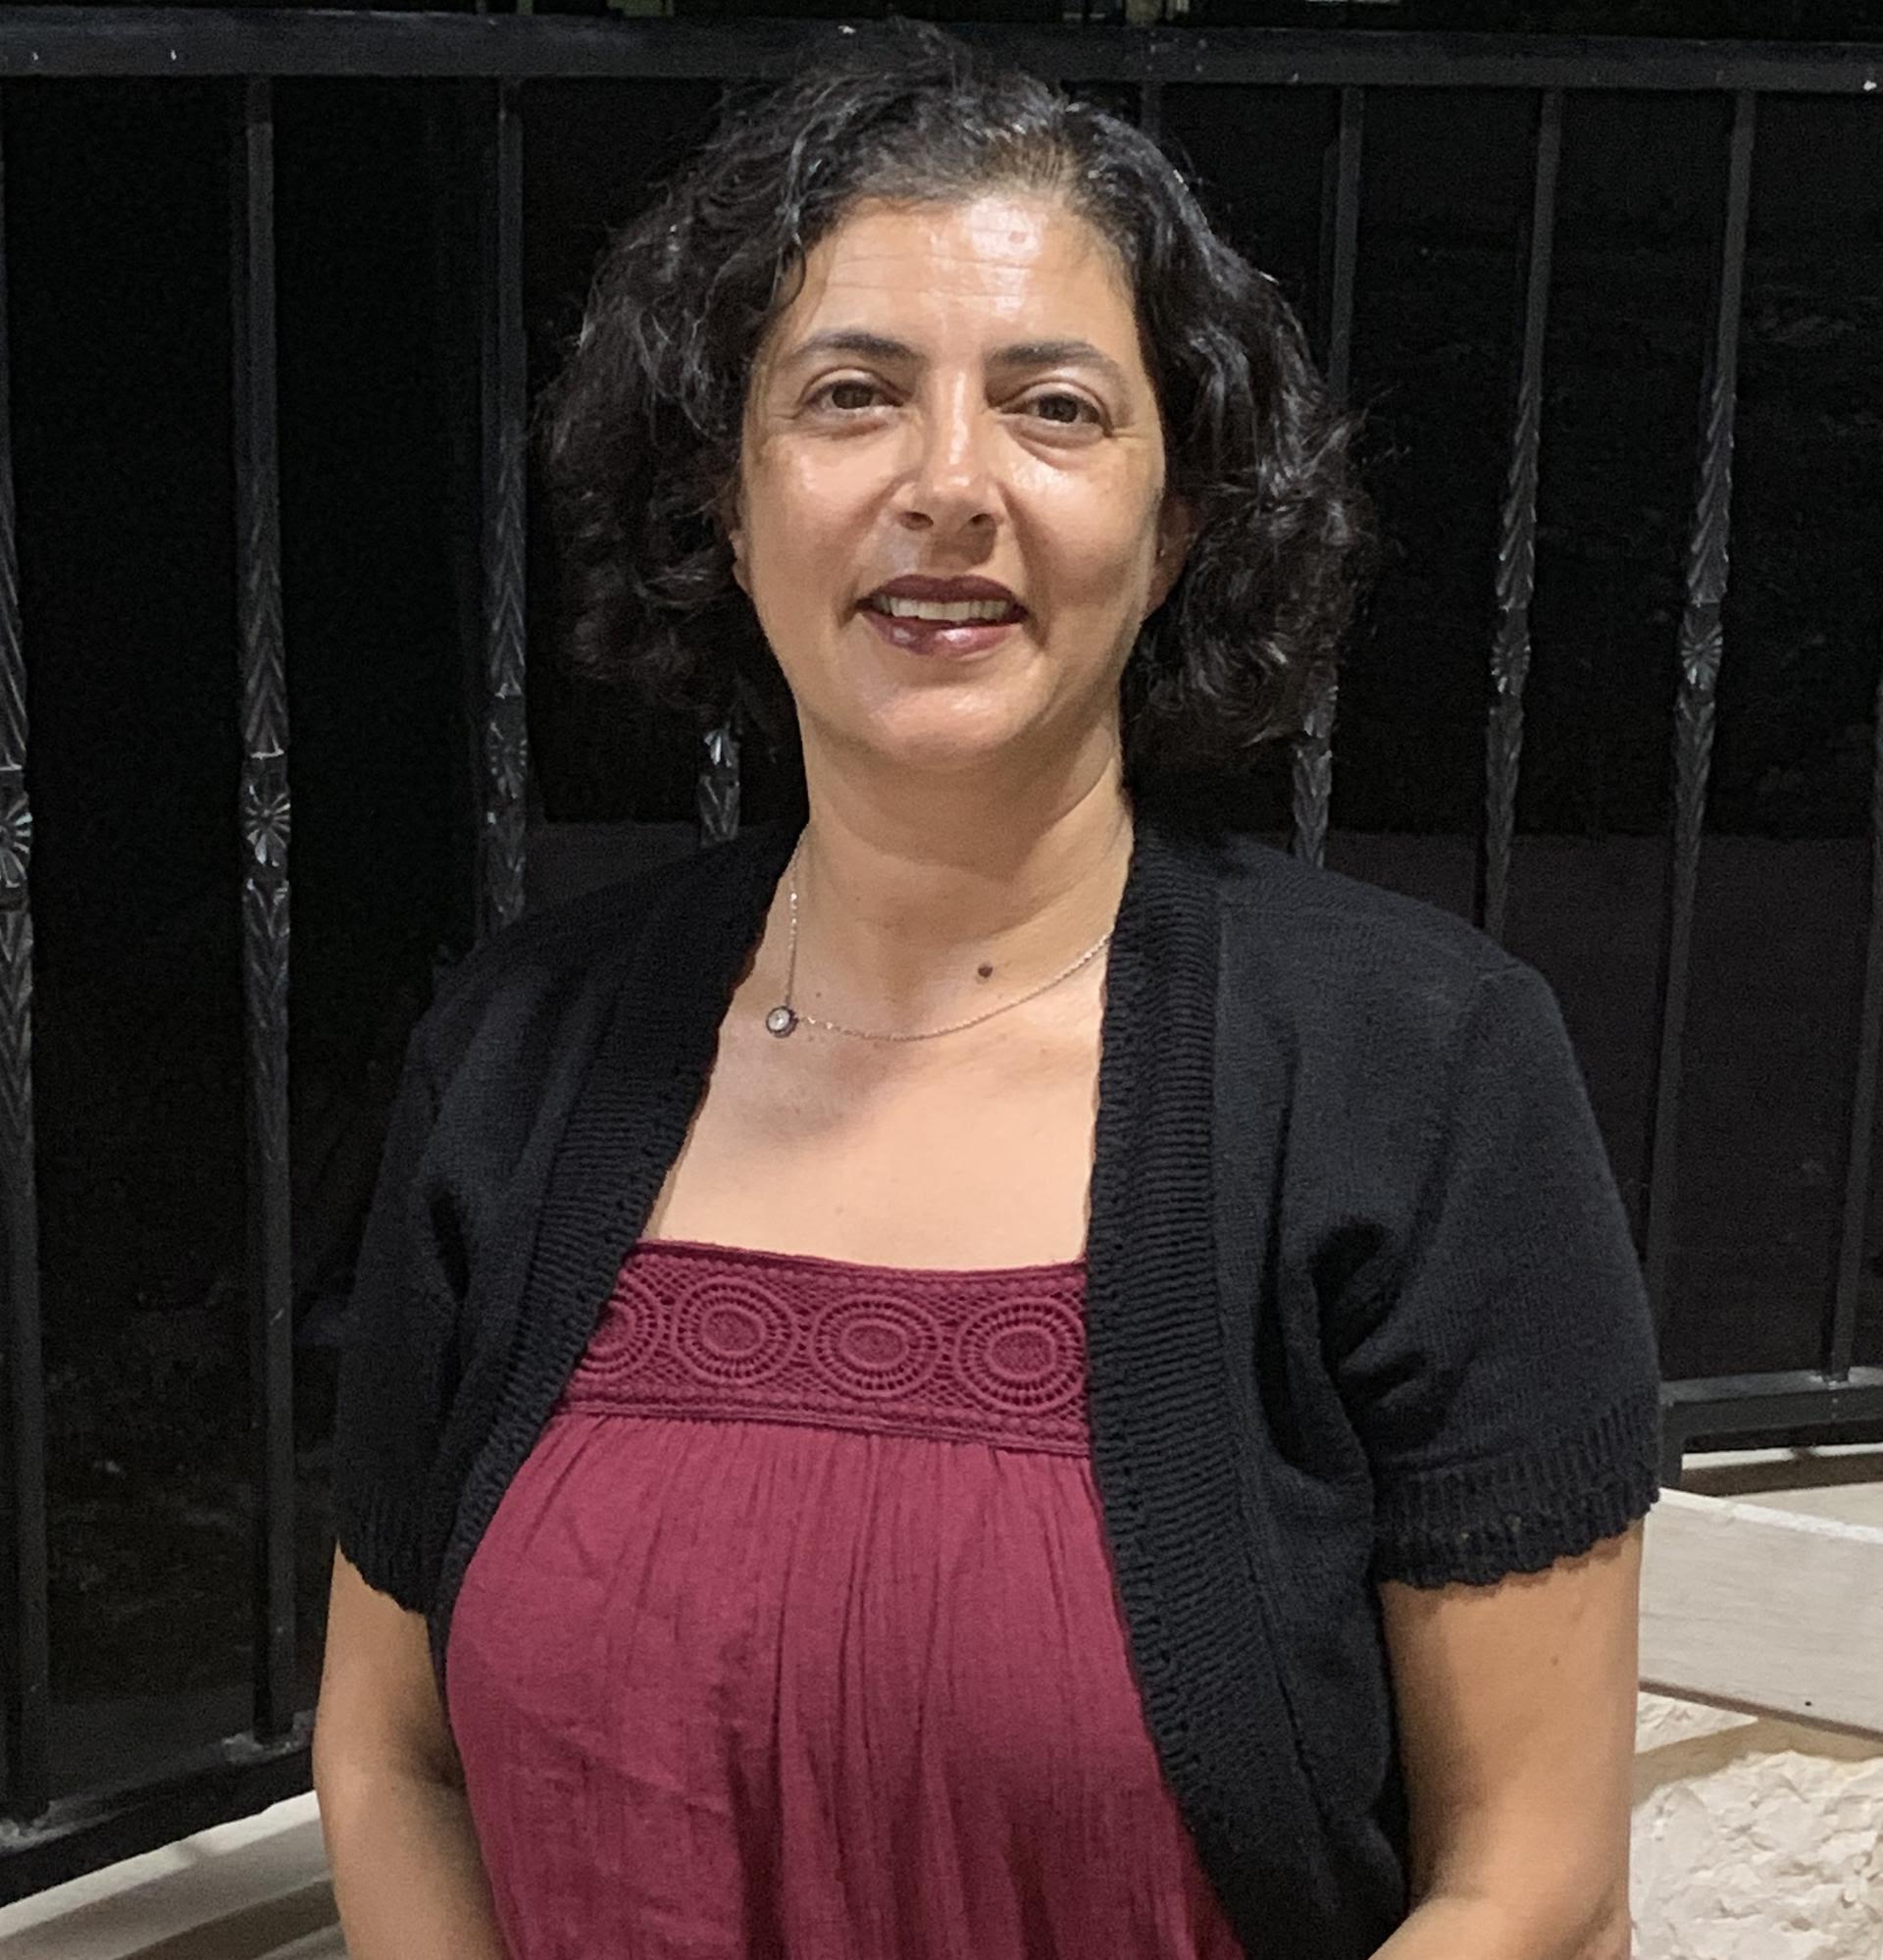 Dr. Kate Lorig